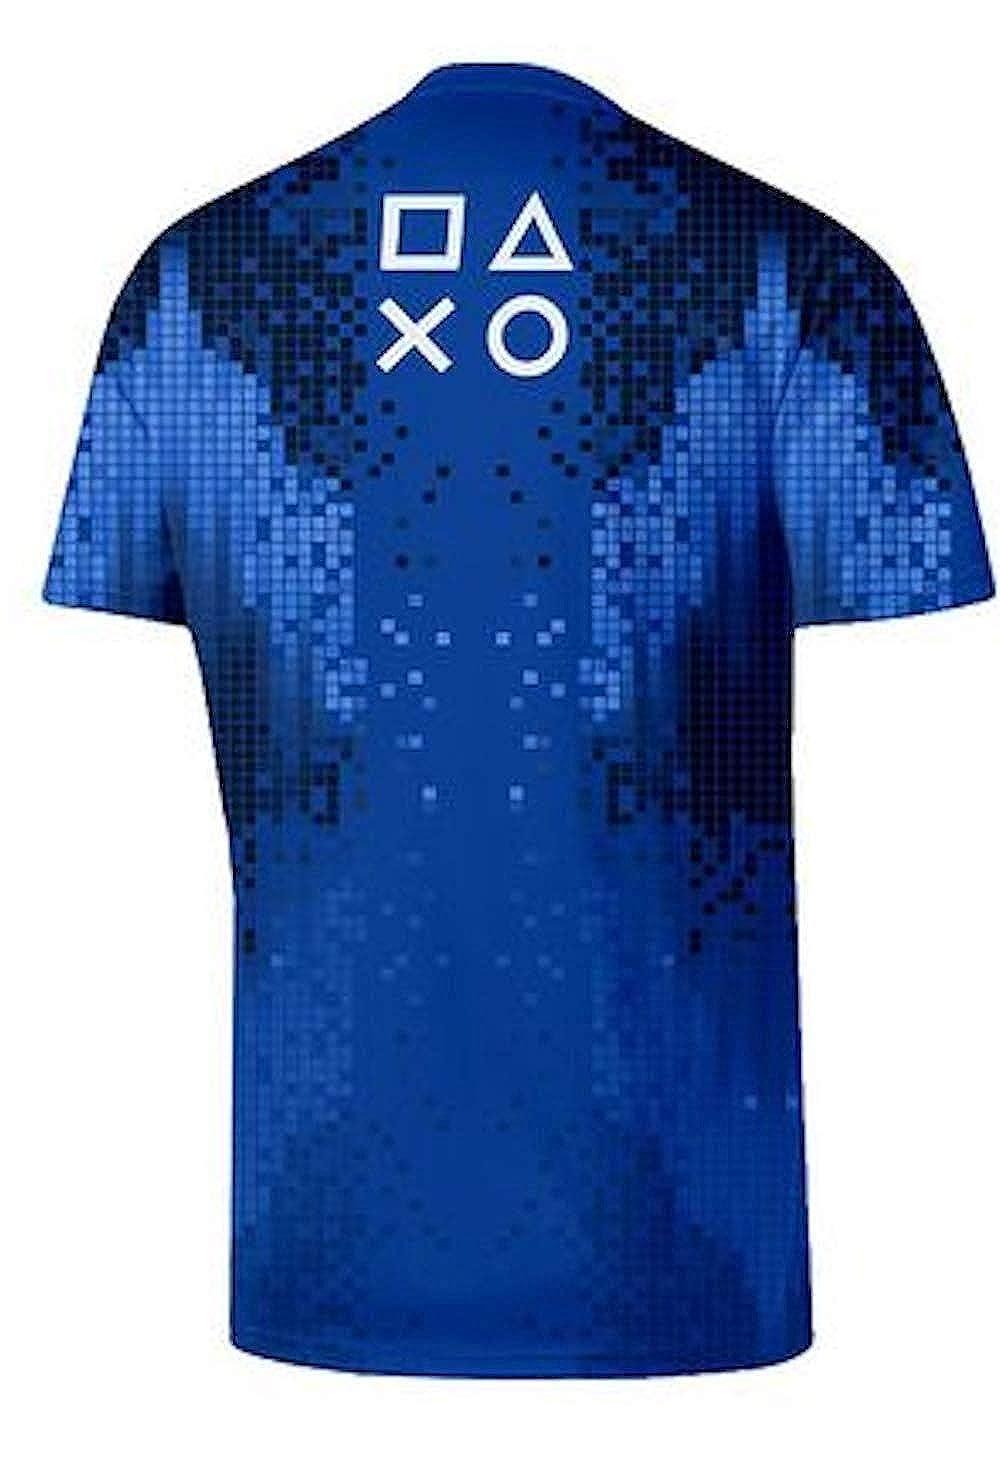 Ufficiale da Uomo Calcio T-Shirt Sony Playstation 8-Bit Esports